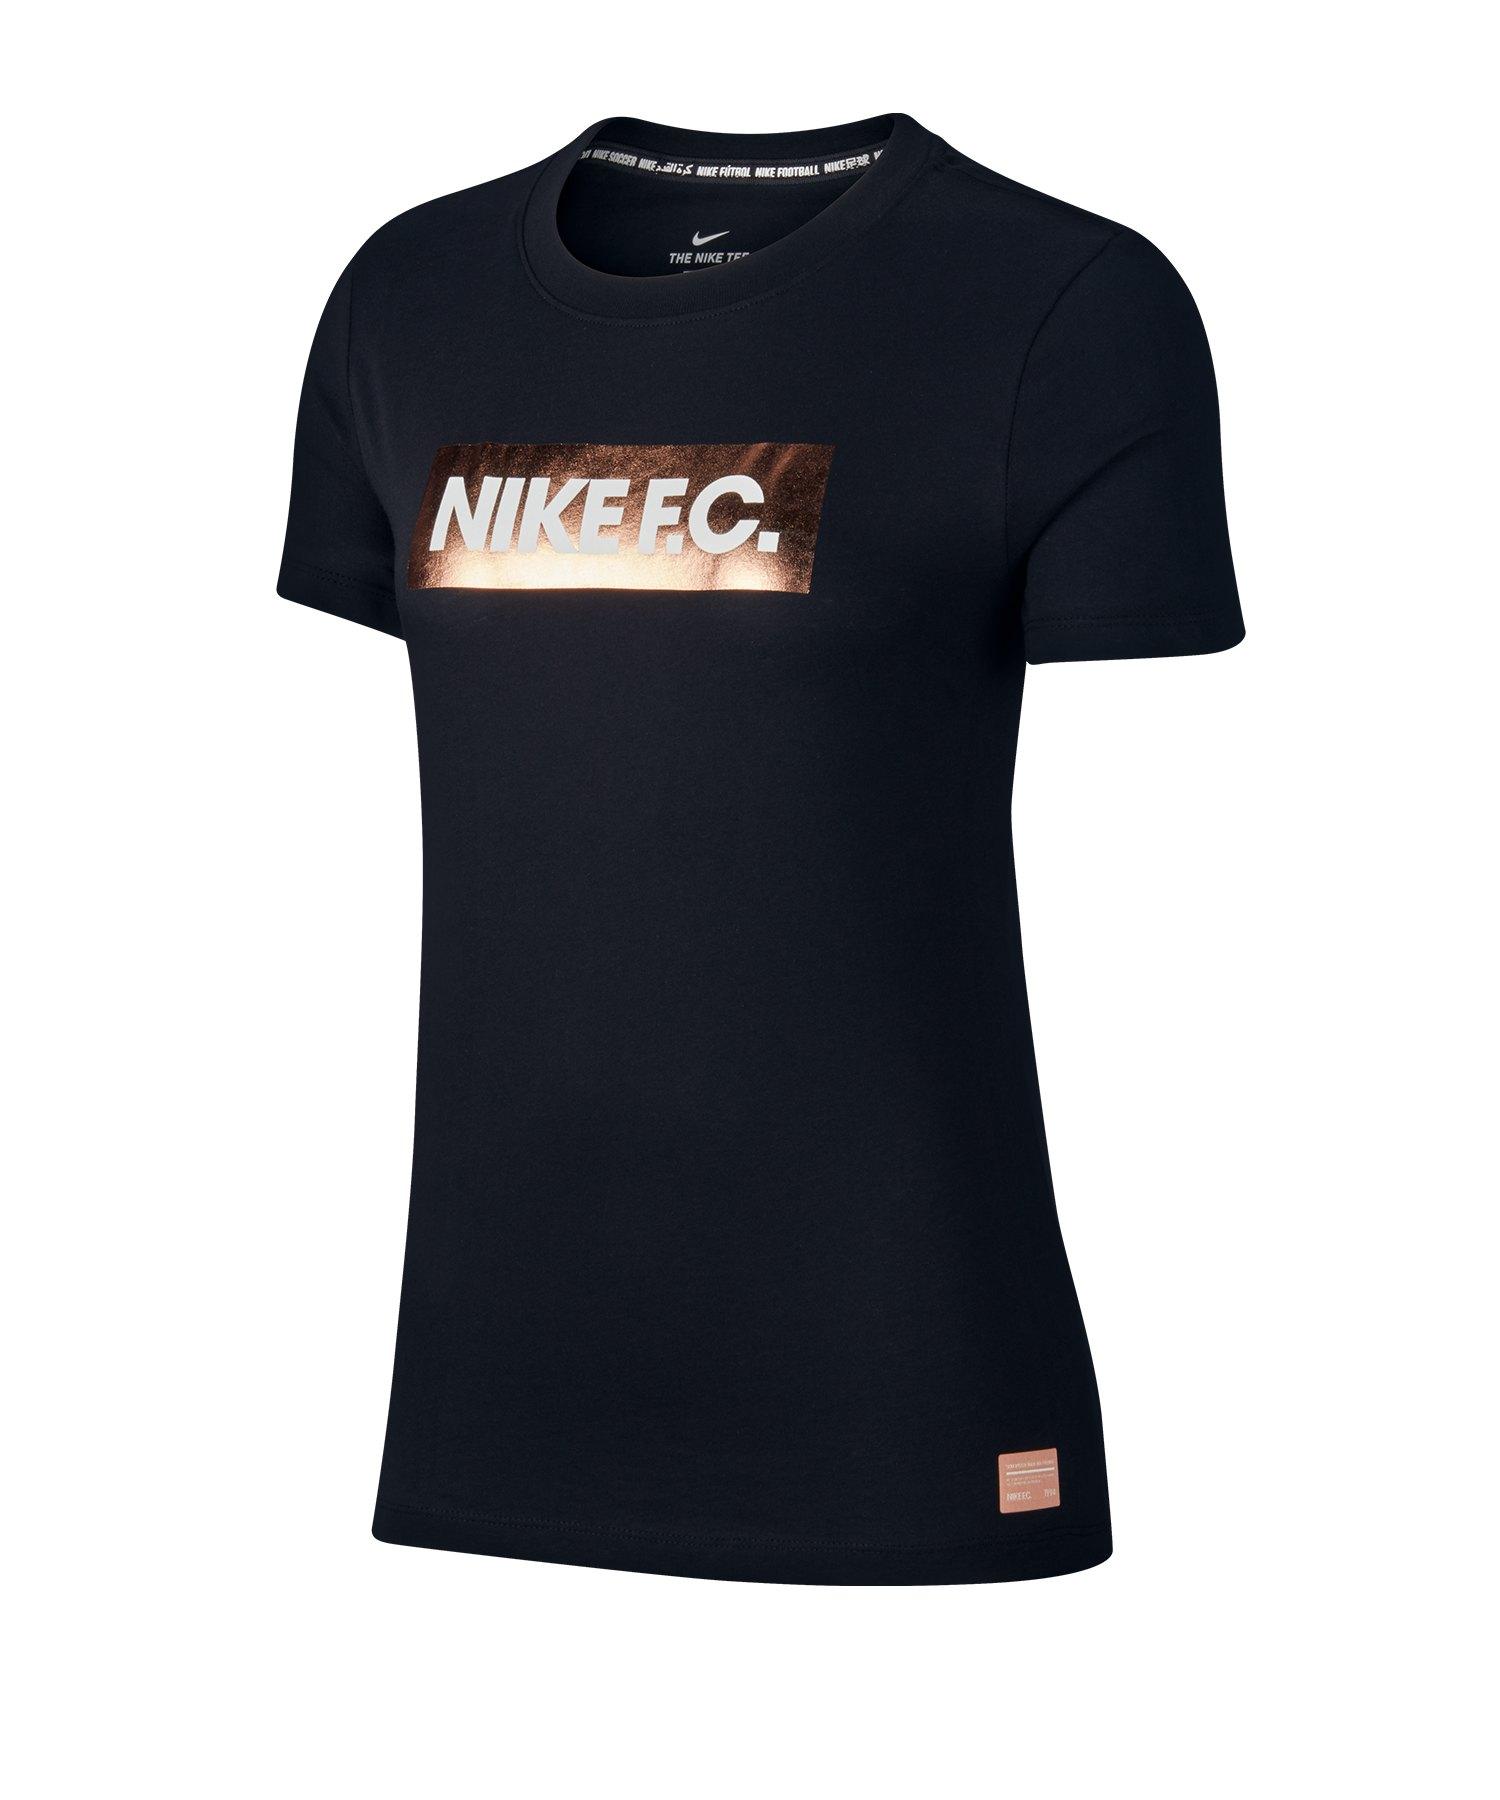 Nike F.C. Block Logo Tee T-Shirt Damen F010 - schwarz